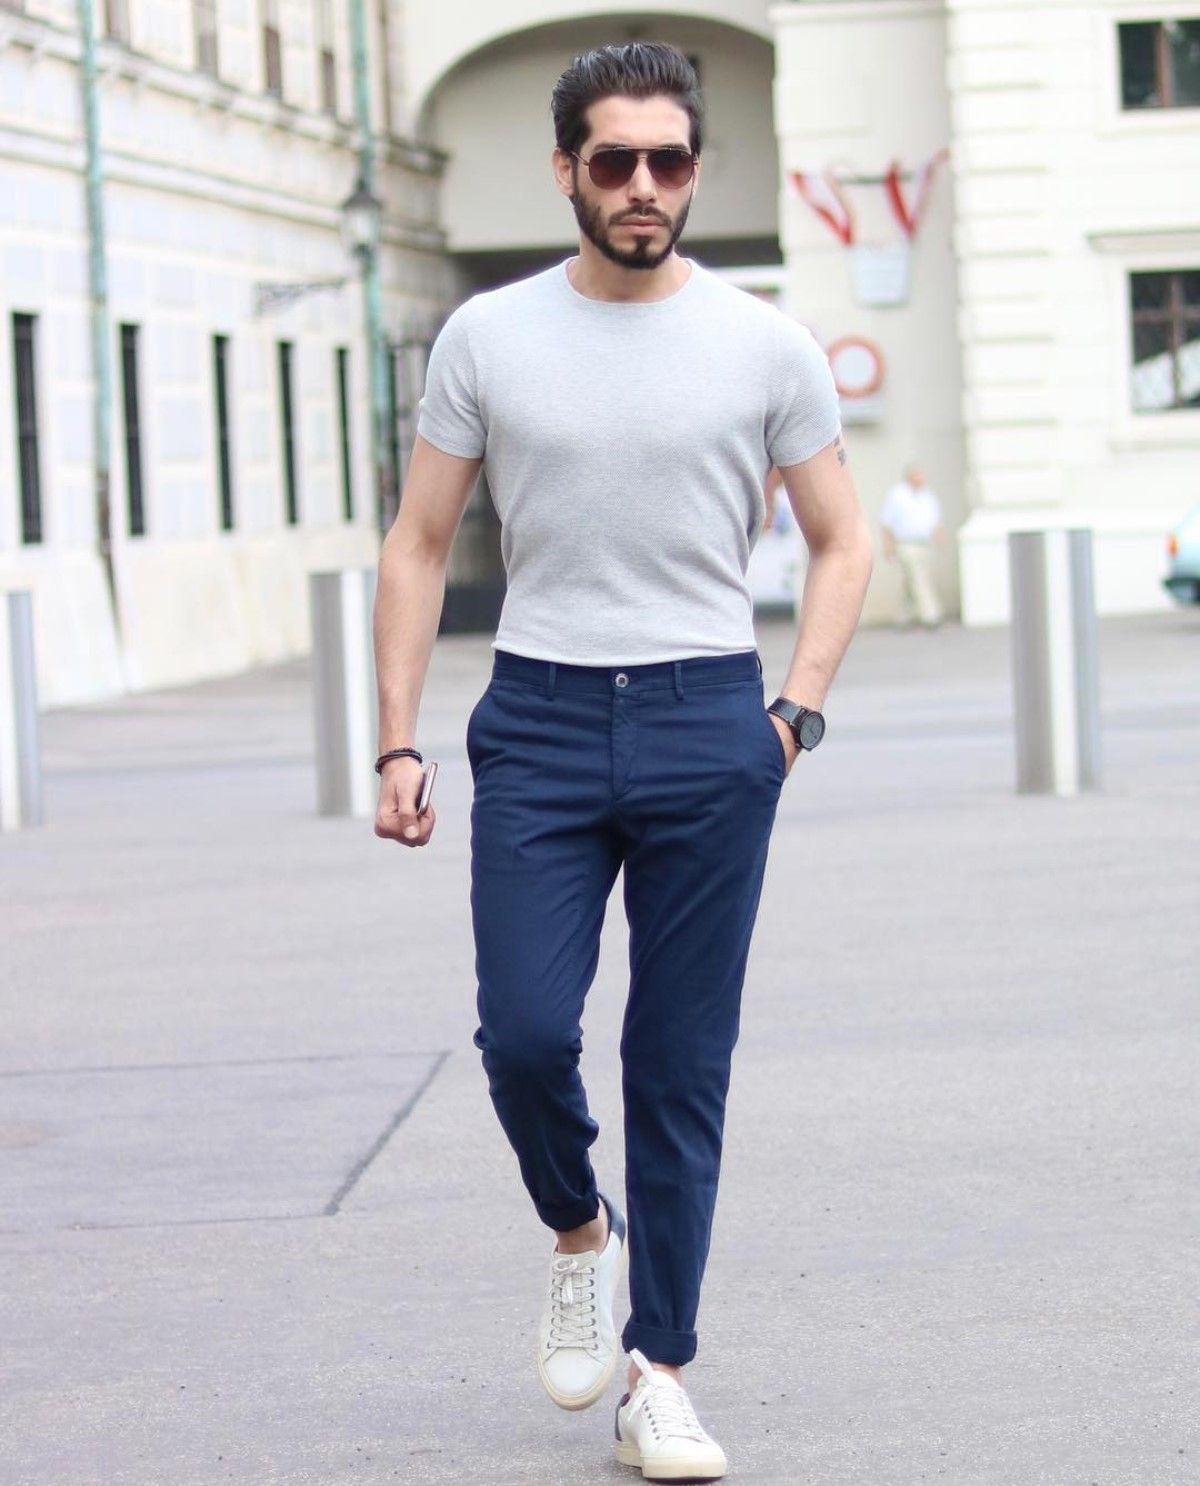 5a2a2ab5c3 Look masculino casual com calça de sarja azul